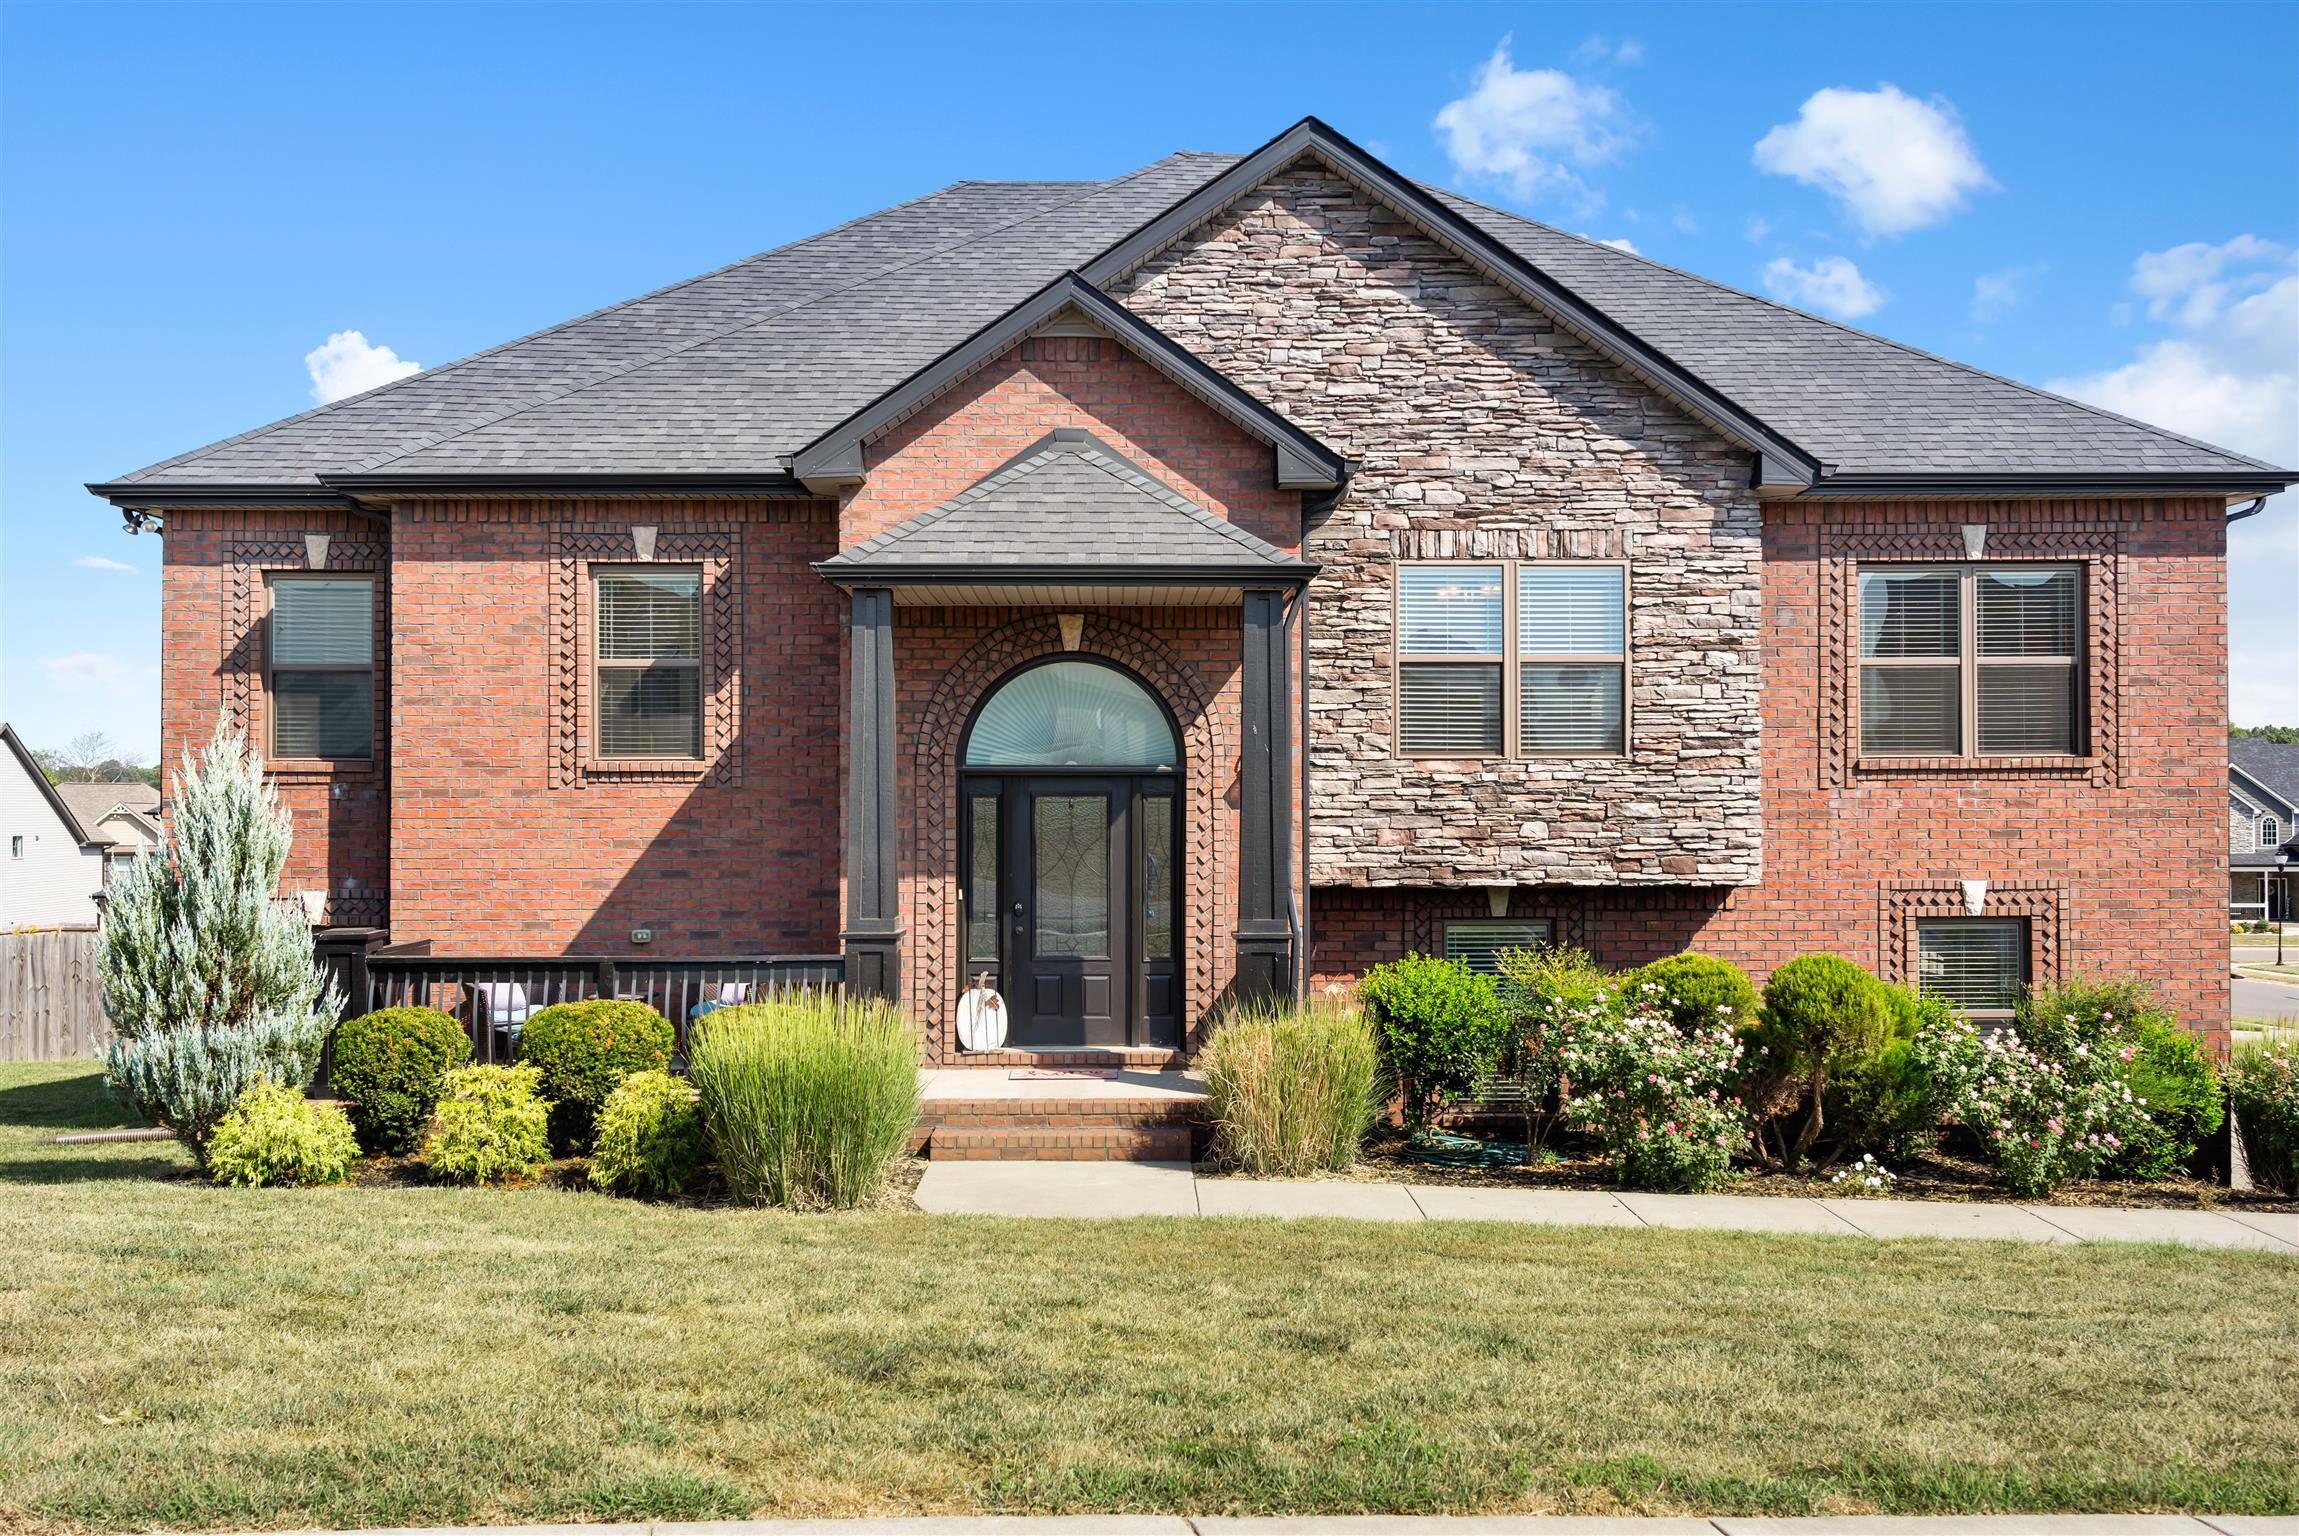 1626 Edgewater Ln, Clarksville, TN 37043 - Clarksville, TN real estate listing